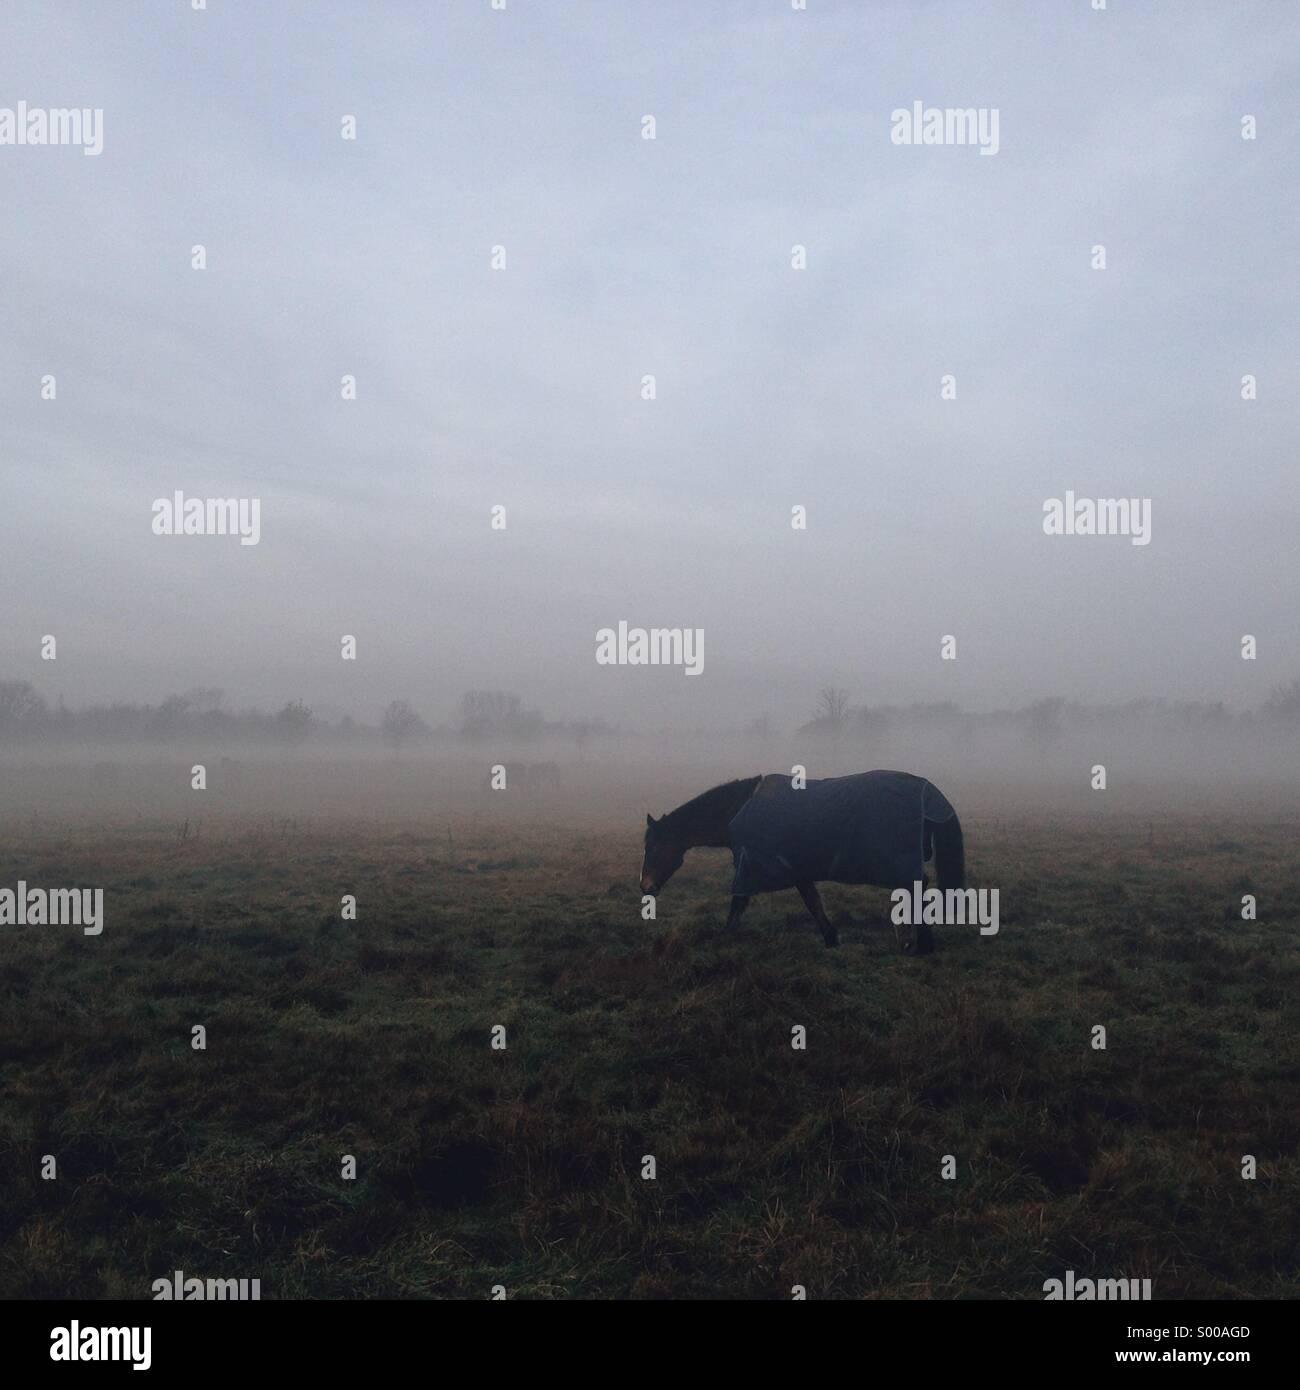 Lonely horse in blue coat on a foggy bleak landscape - Stock Image